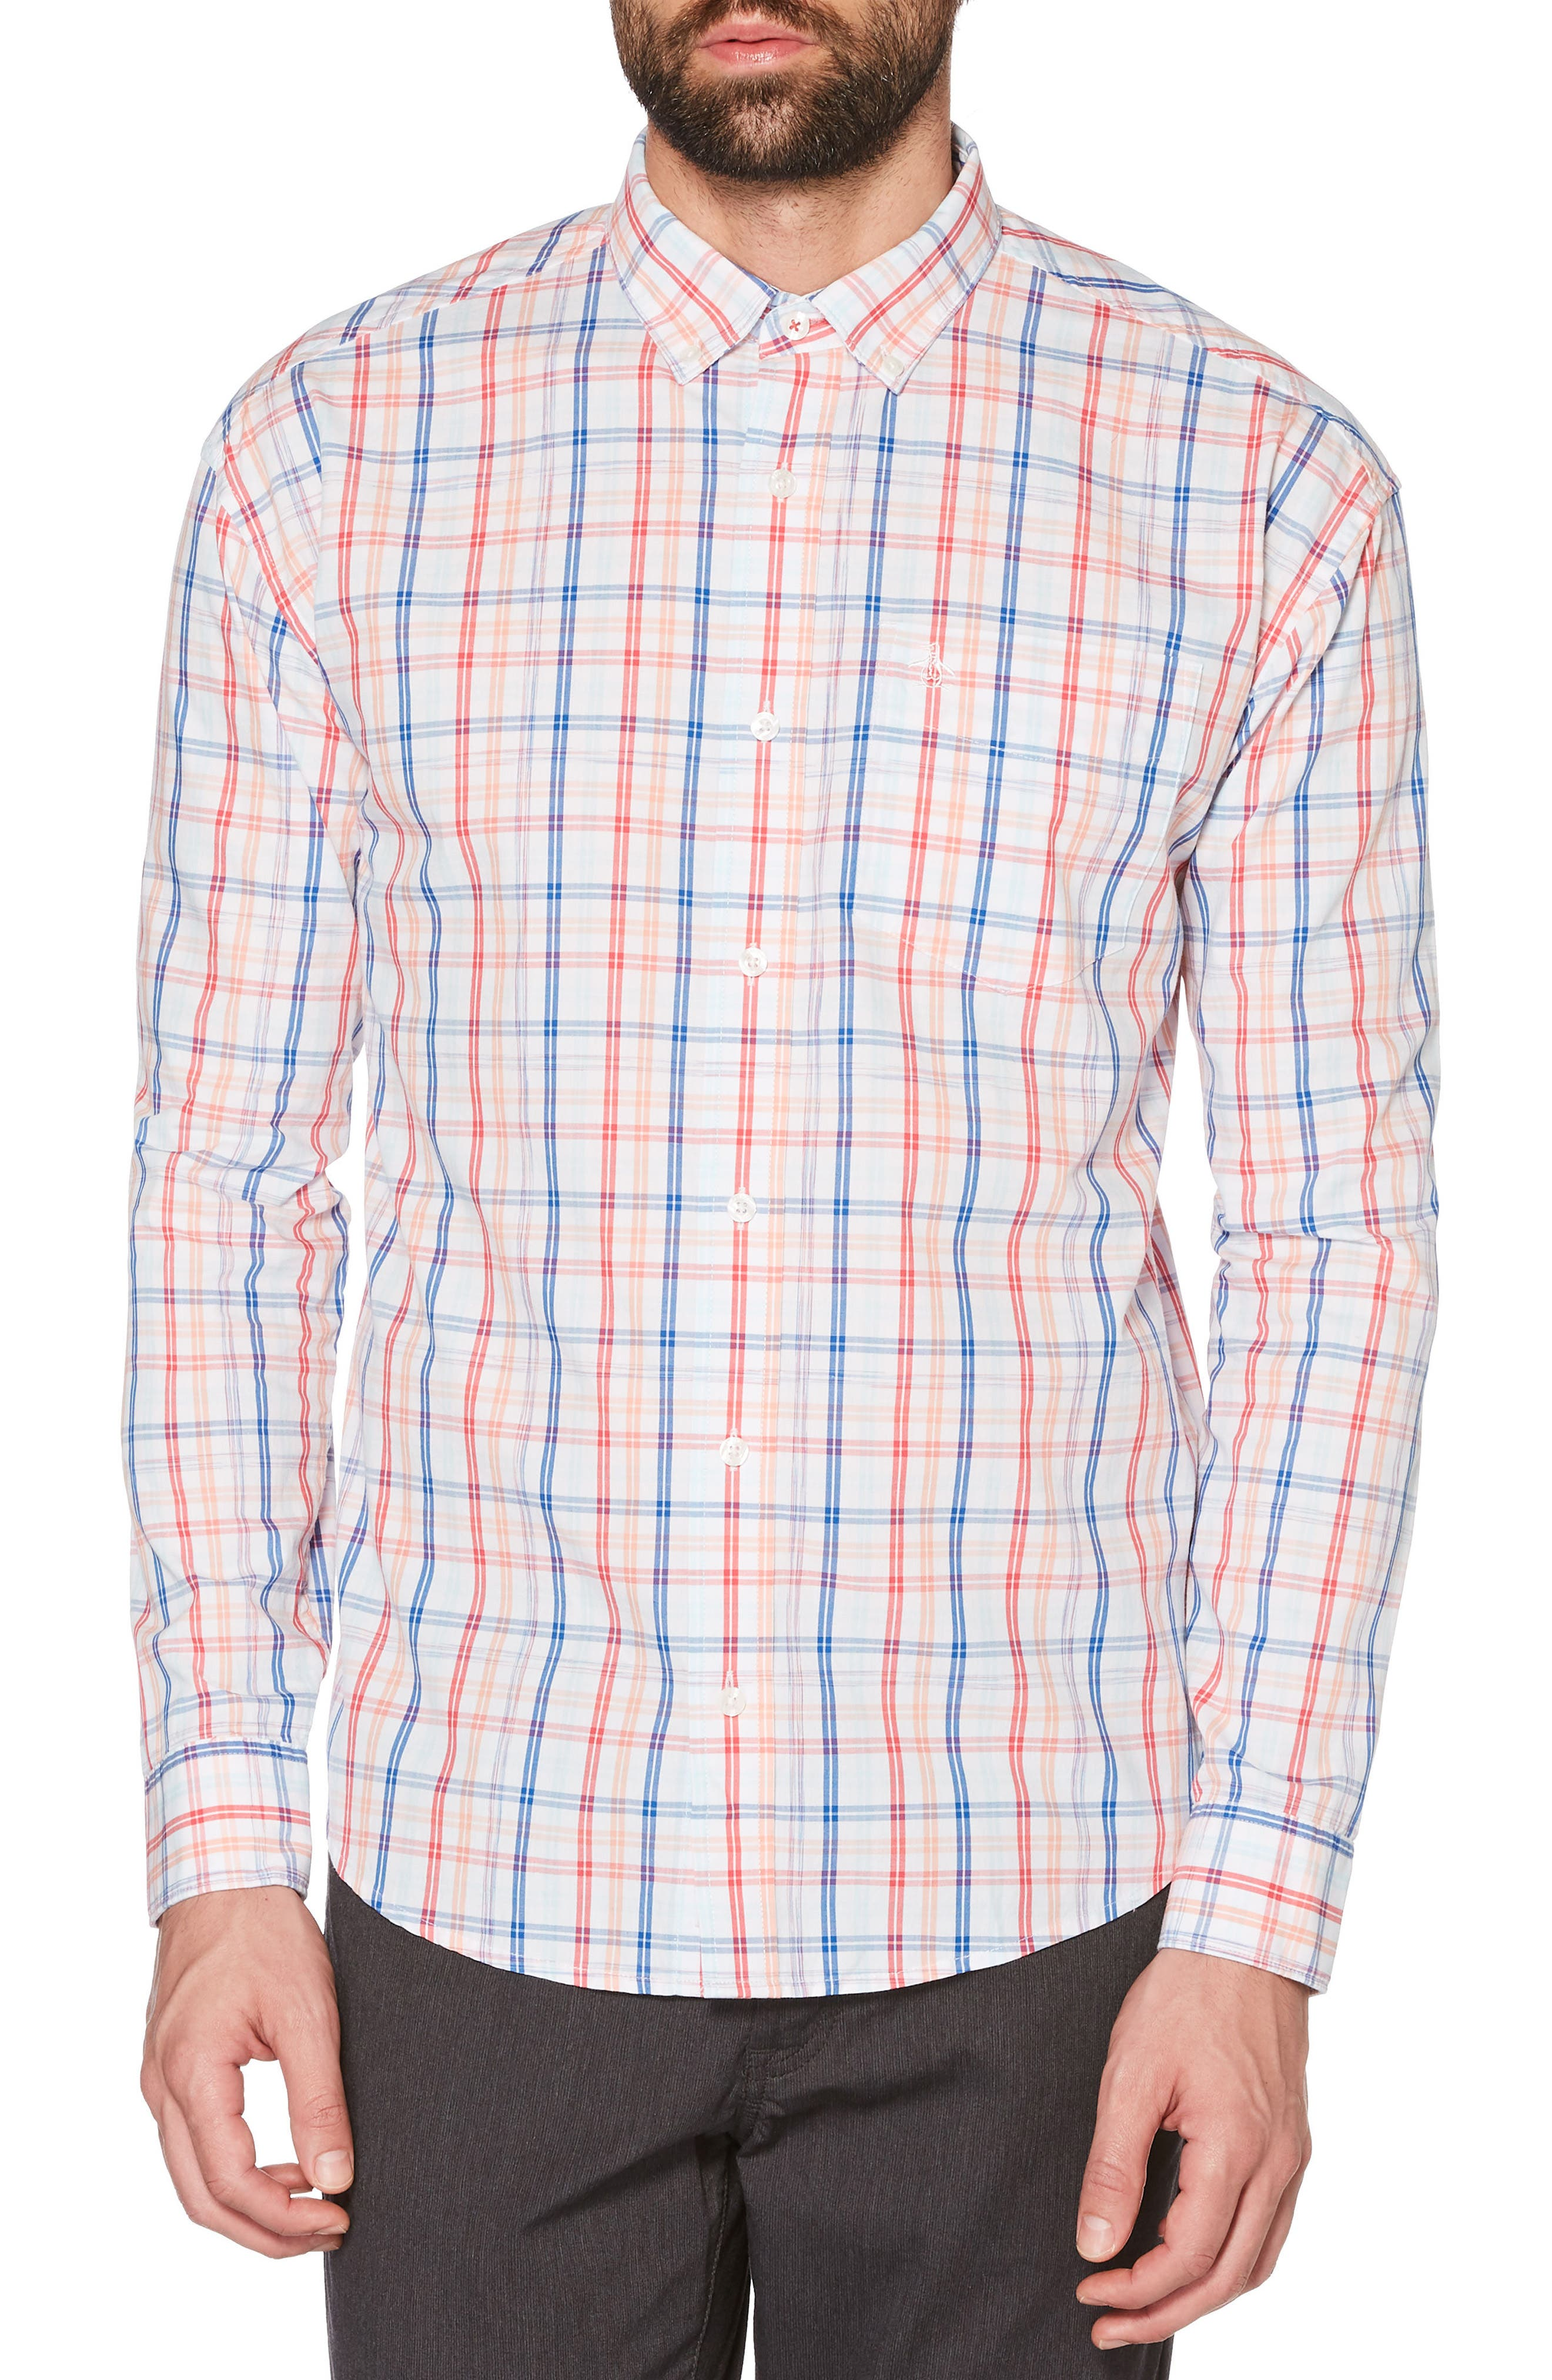 P55 Space Dye Plaid Shirt,                         Main,                         color, Bright White